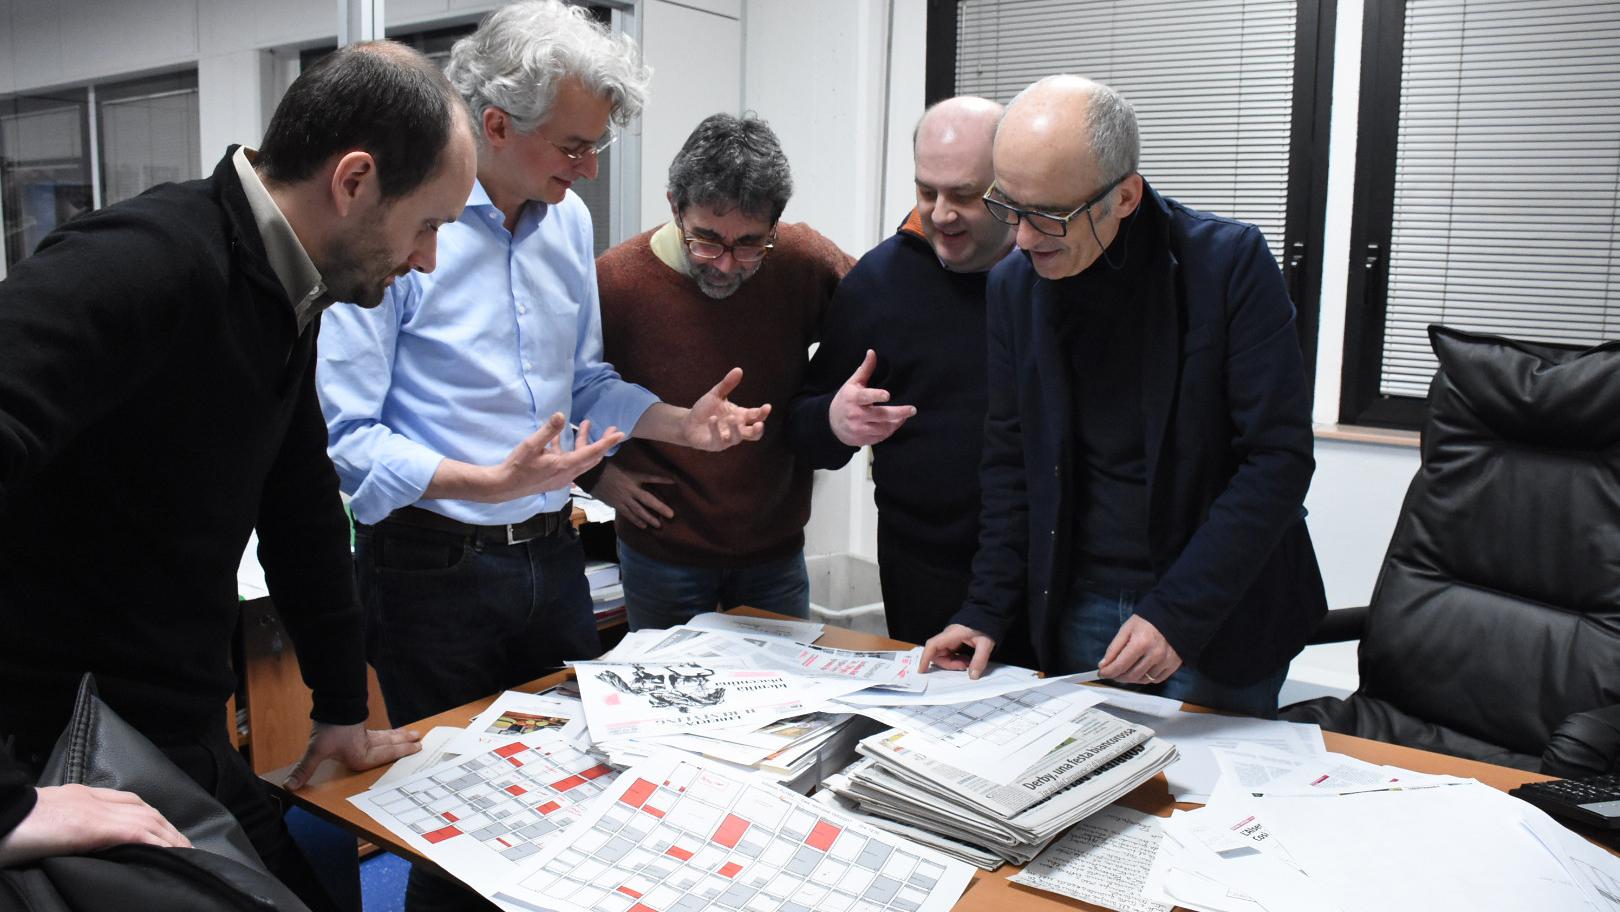 SE_Wenceslau_News_Design_Photo_Liberta 5